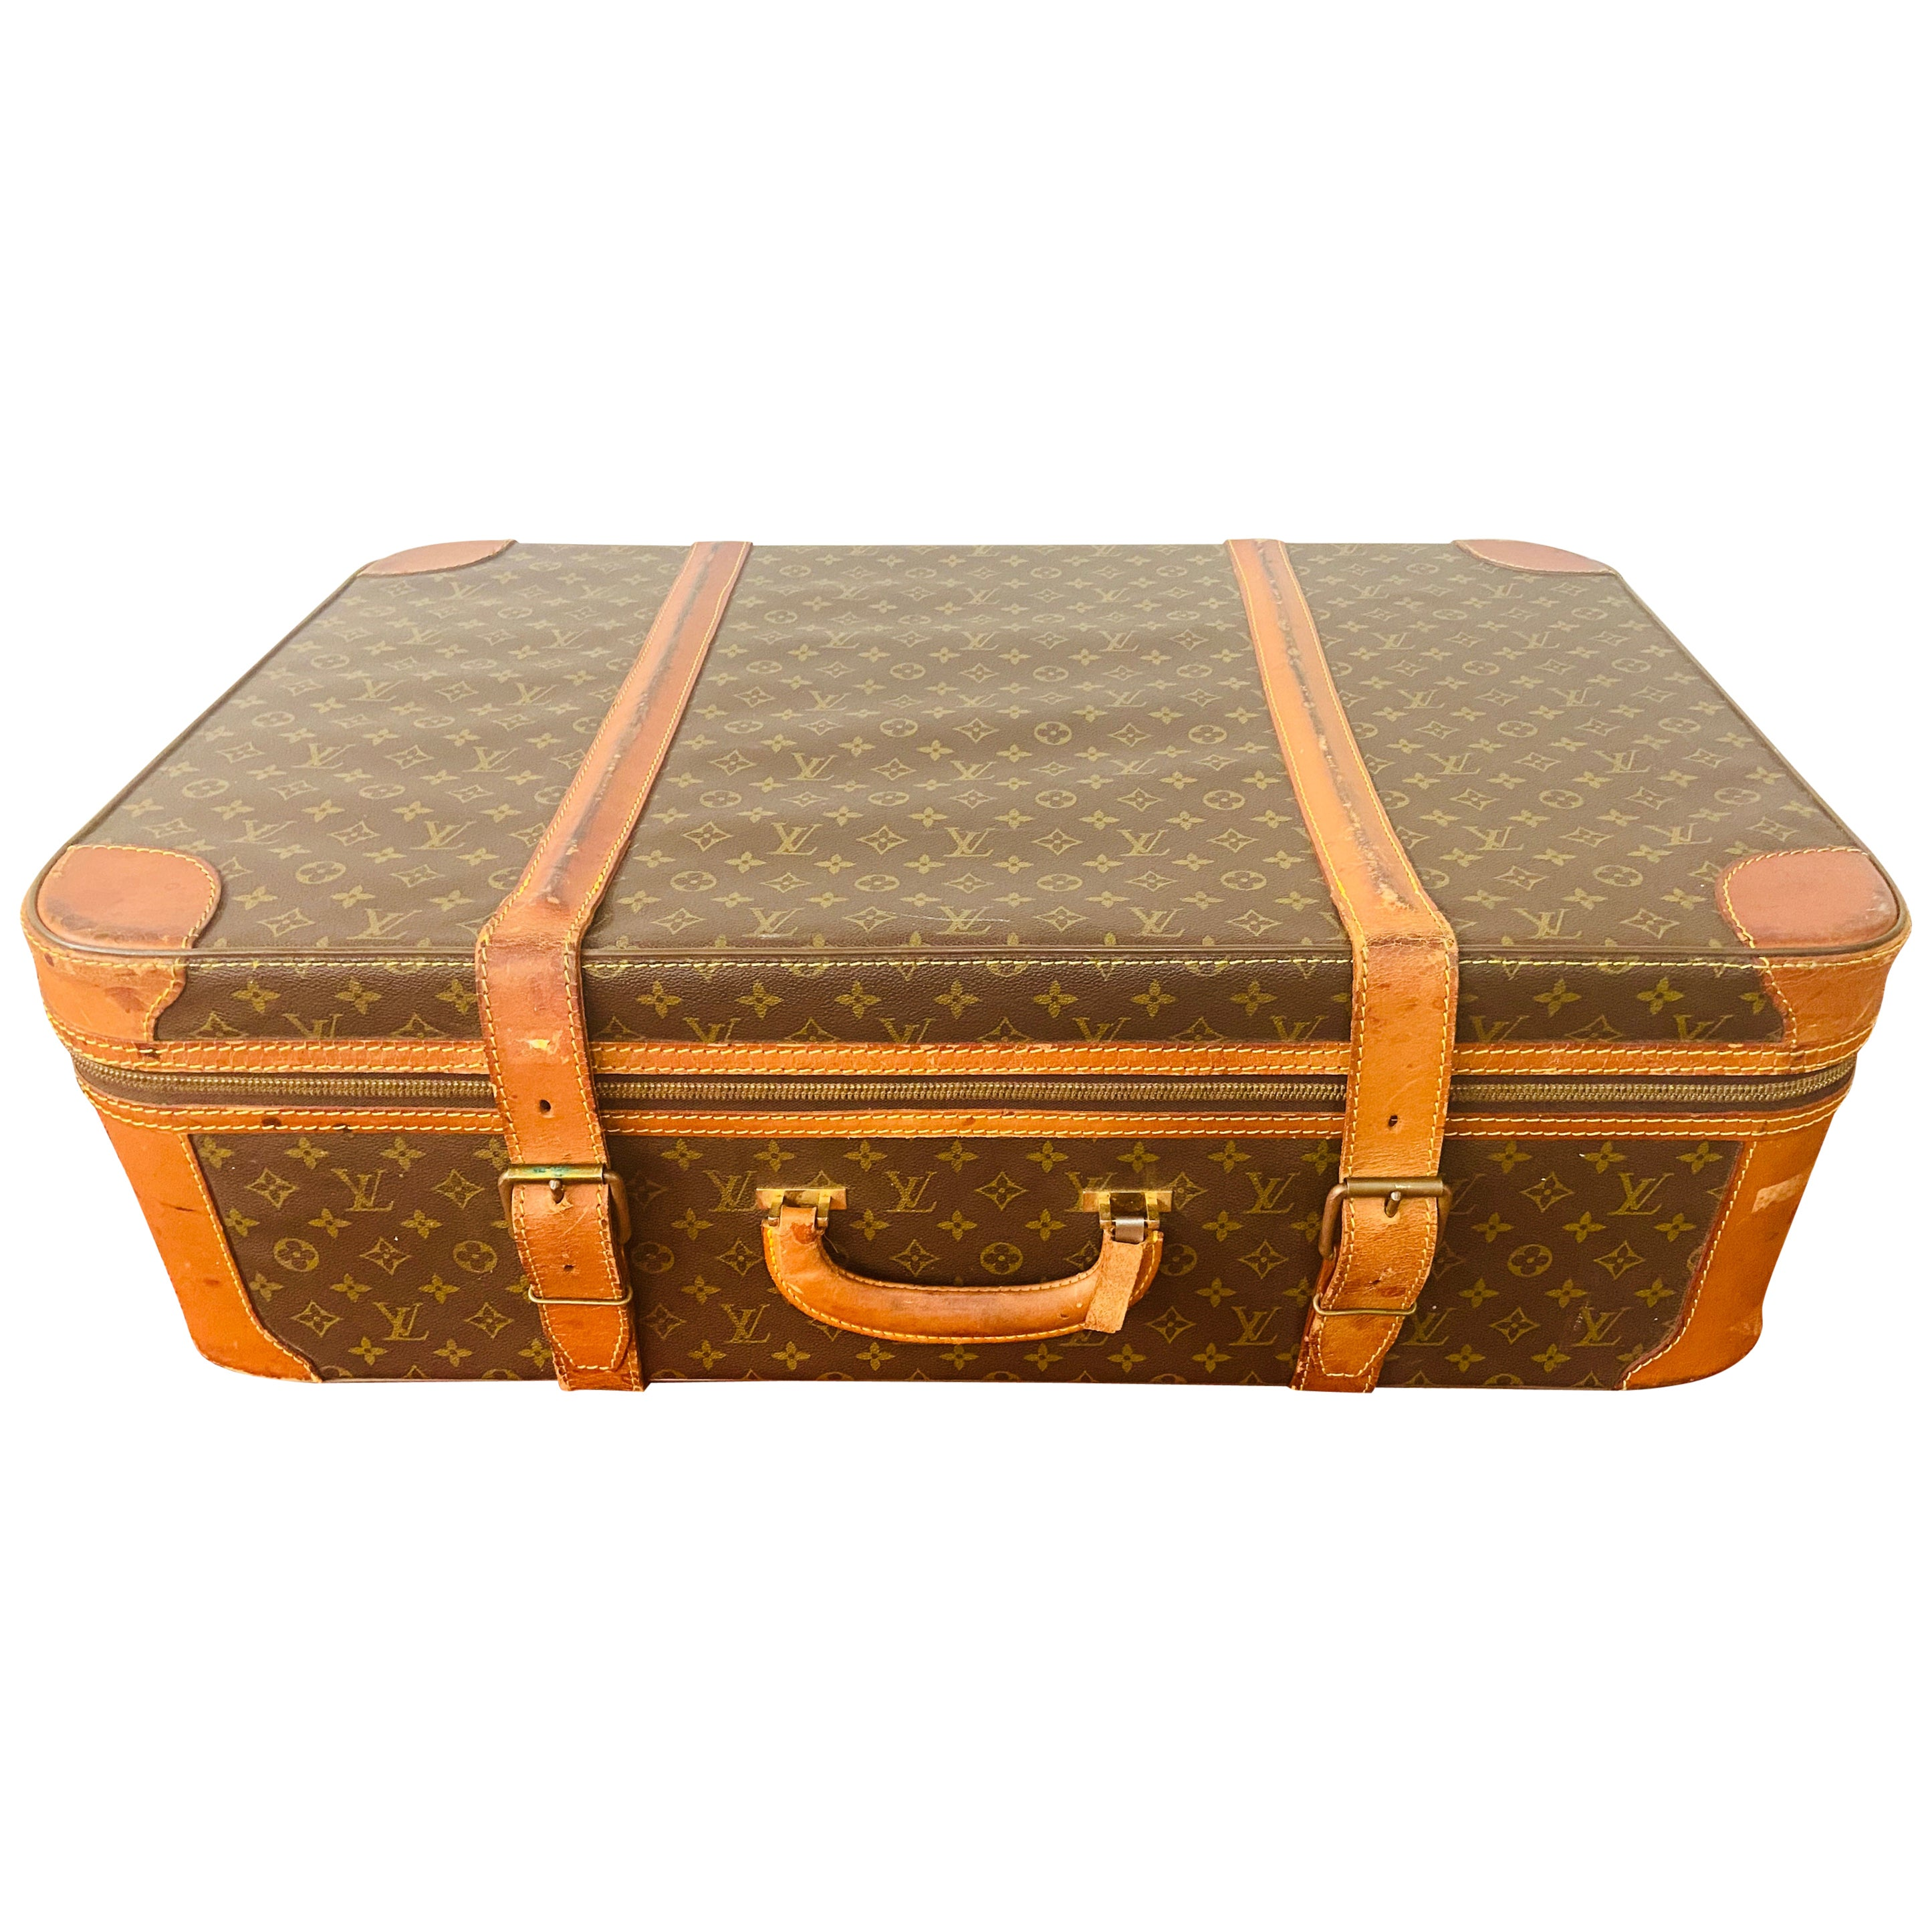 Louis Vuitton Monogram Holdall Luggage Bag or Suitcase